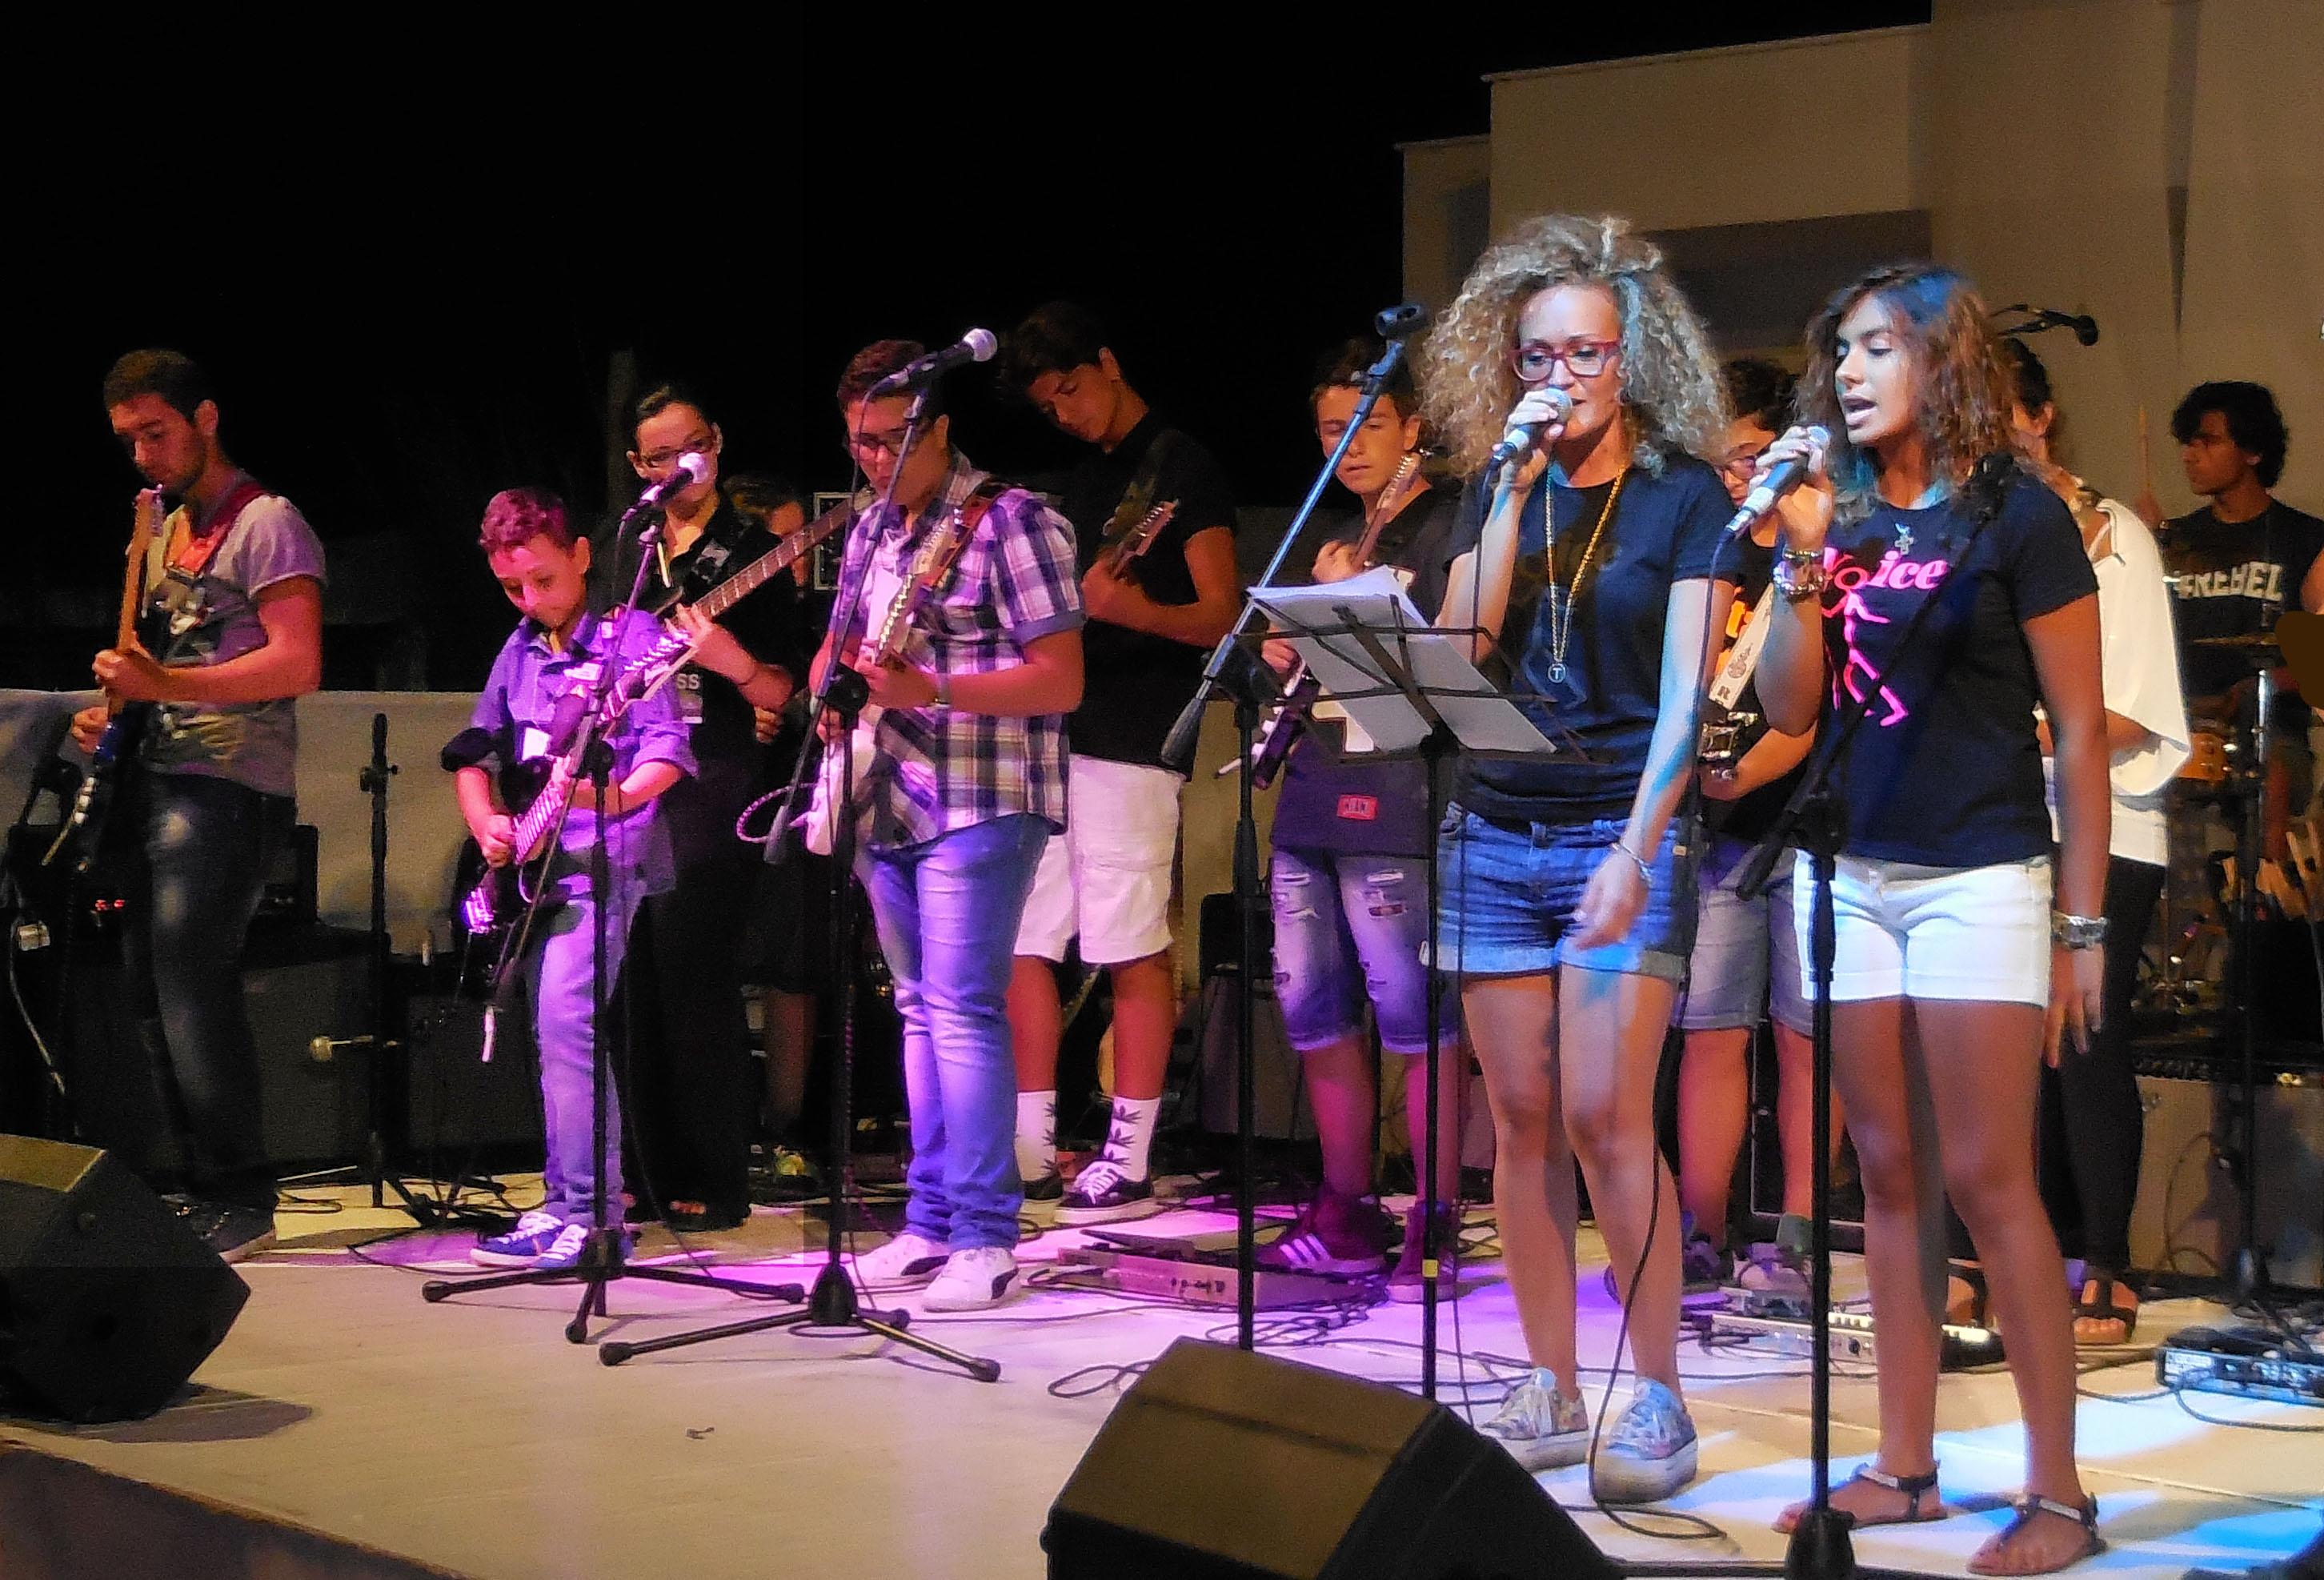 Concerto Allievi Tarrega orizzontale